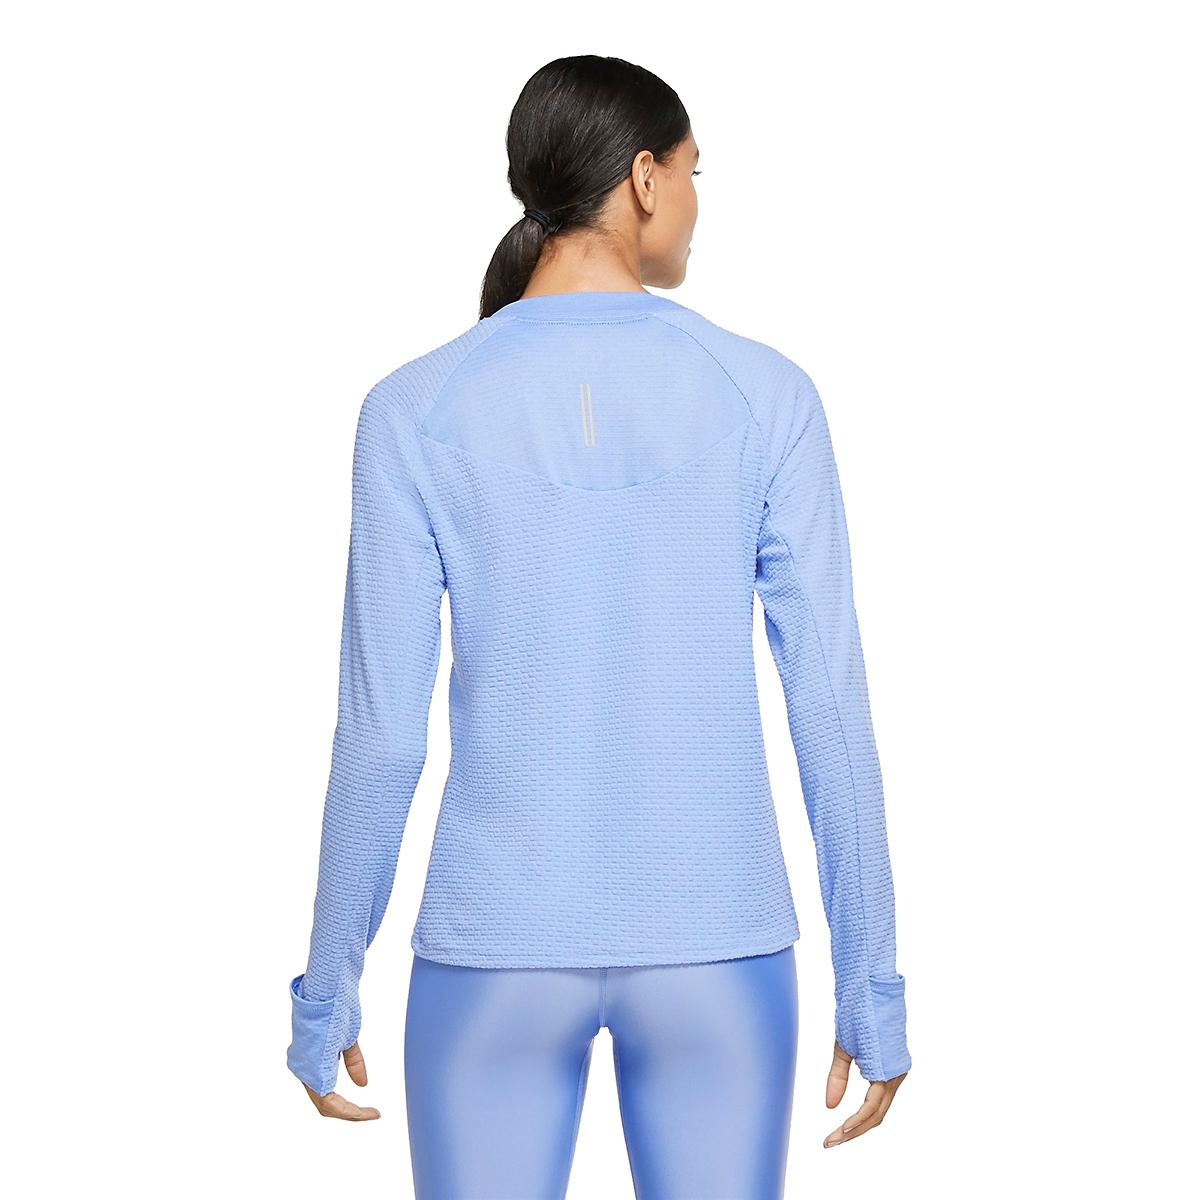 Women's Nike Sphere Crew Long Sleeve Shirt - Color: Royal Pulse/Reflective Silver - Size: XS, Royal Pulse/Reflective Silver, large, image 4